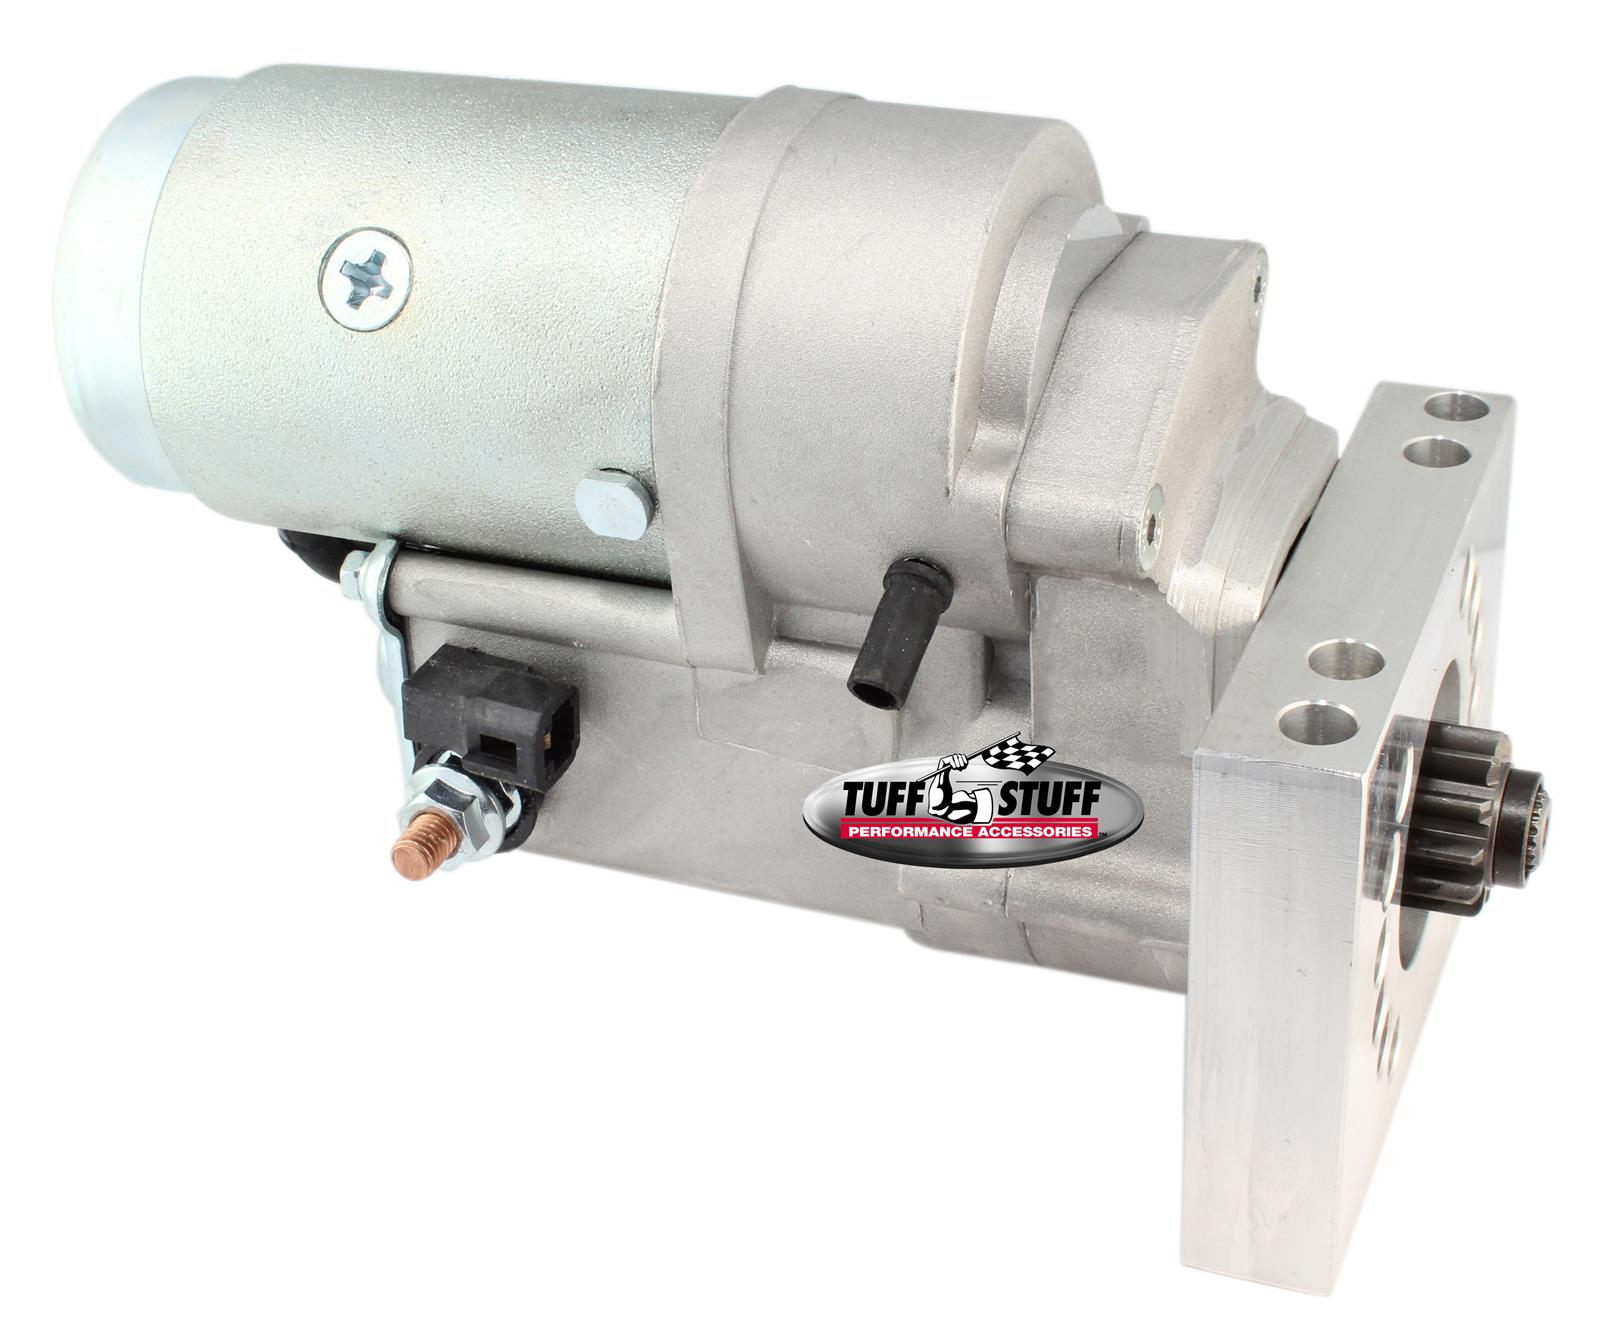 Tuff Stuff Performance Gear Reduction Starters 3193NB